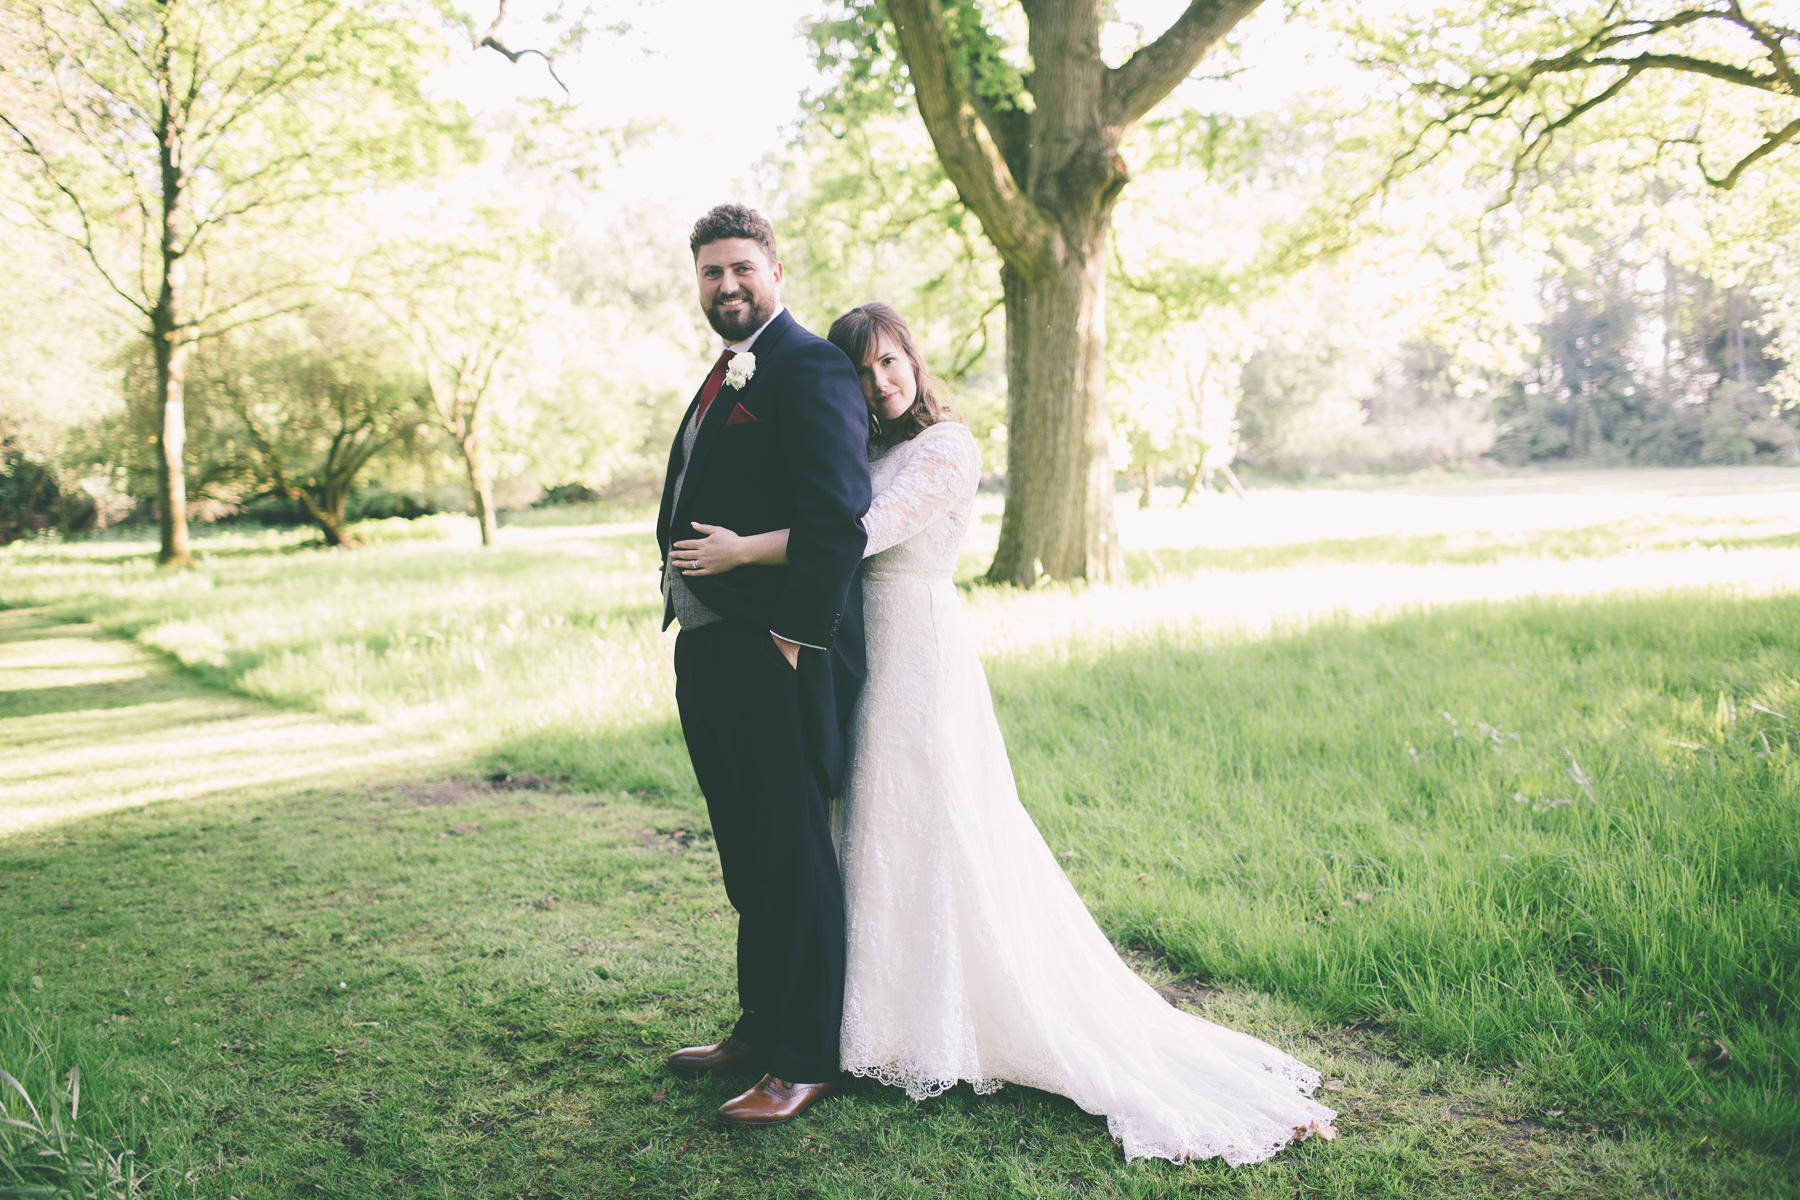 Pamber-Place-wedding-photography-basingstoke-hampshire-190